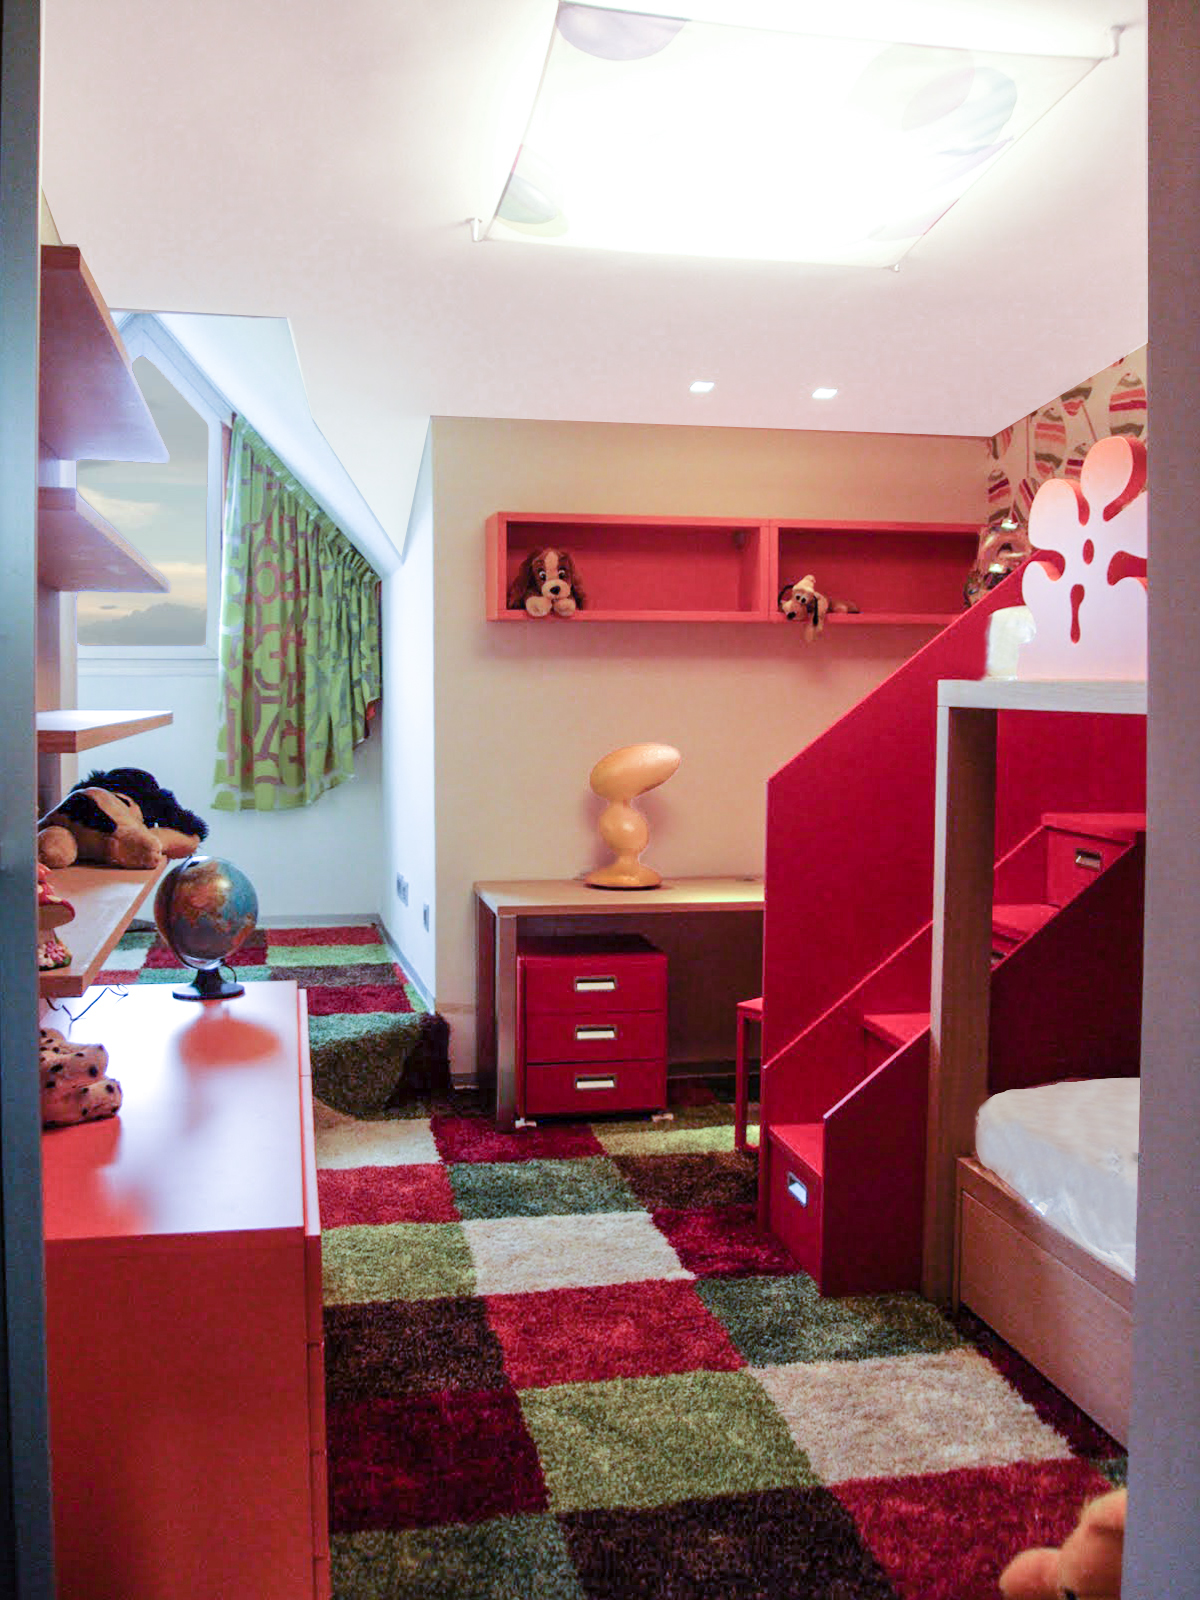 Isolina.Mallon.Interiors.Navacerrada.Remodel2.jpg